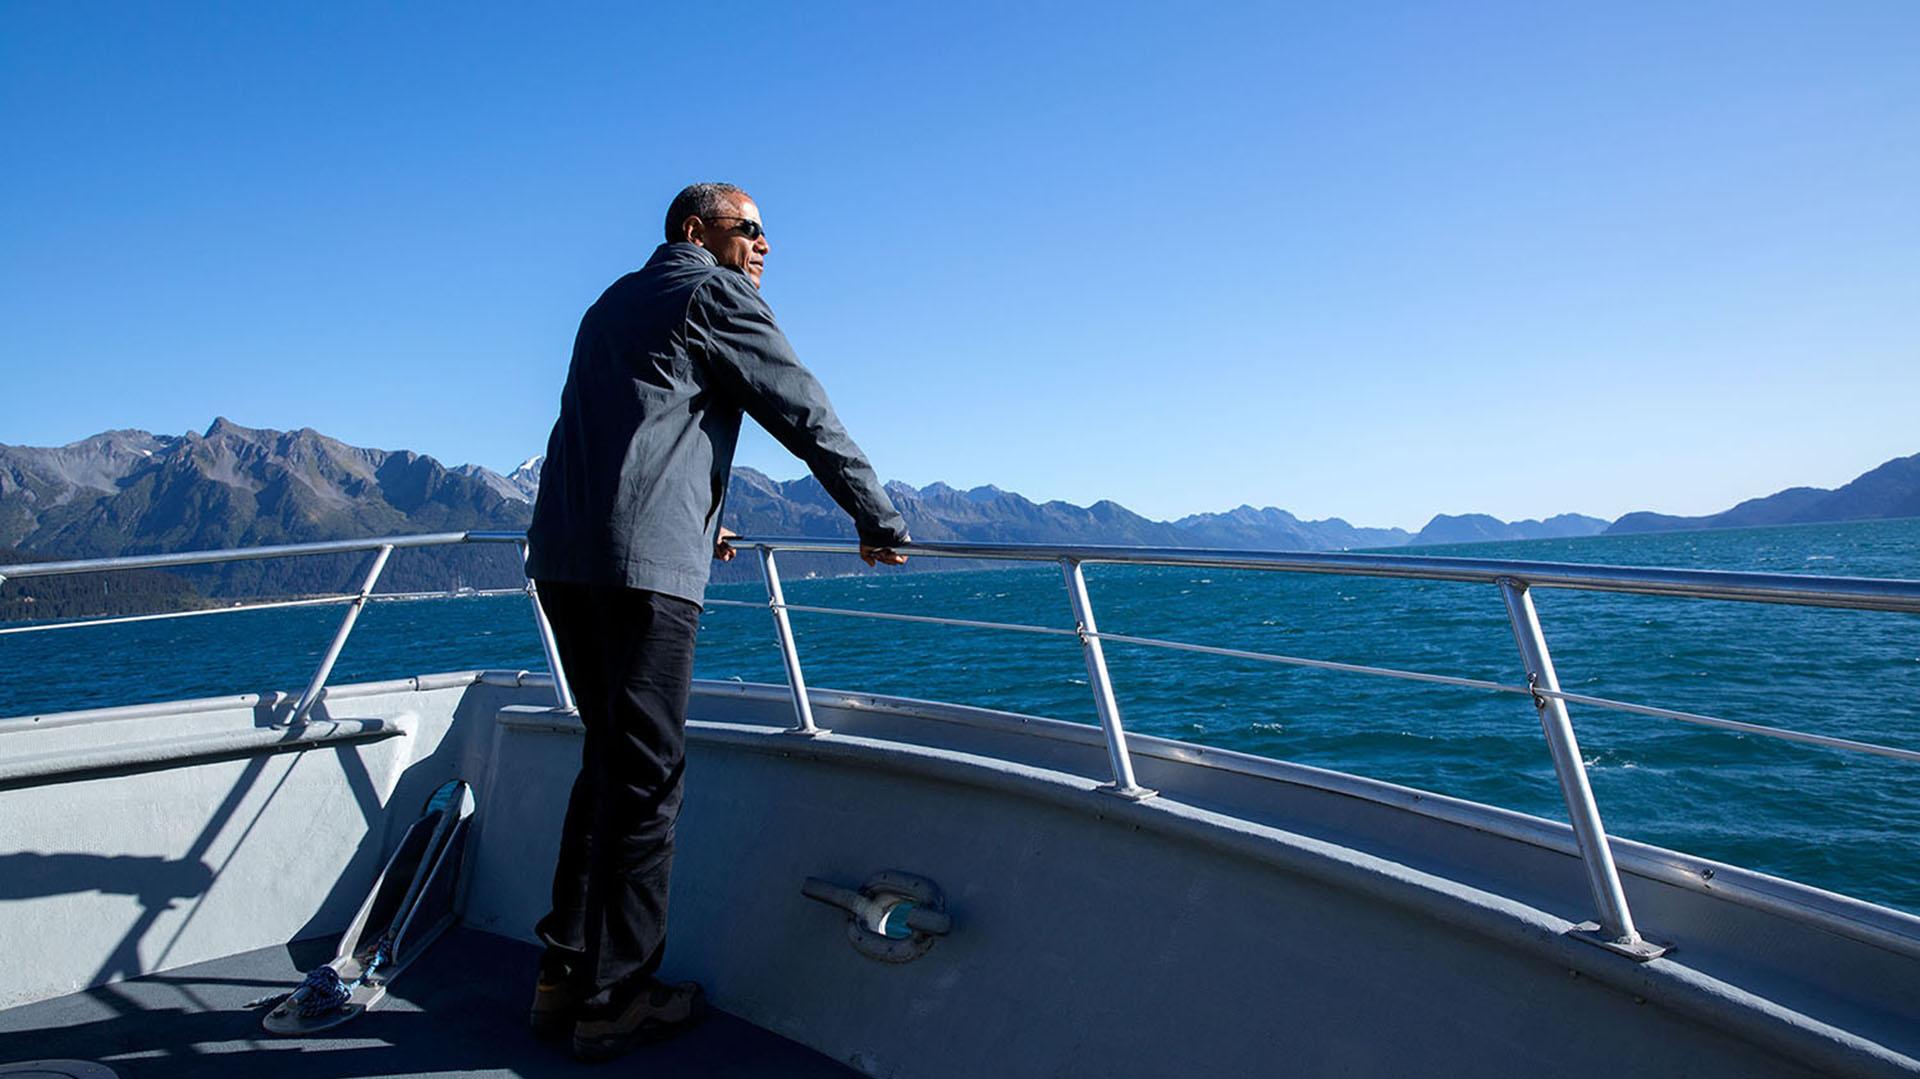 Obama abordo de un bote en el Parque Nacional de los fiordos Kenai en Alaska. 1° d septiembre de 2015(Official White House Photo by Pete Souza).